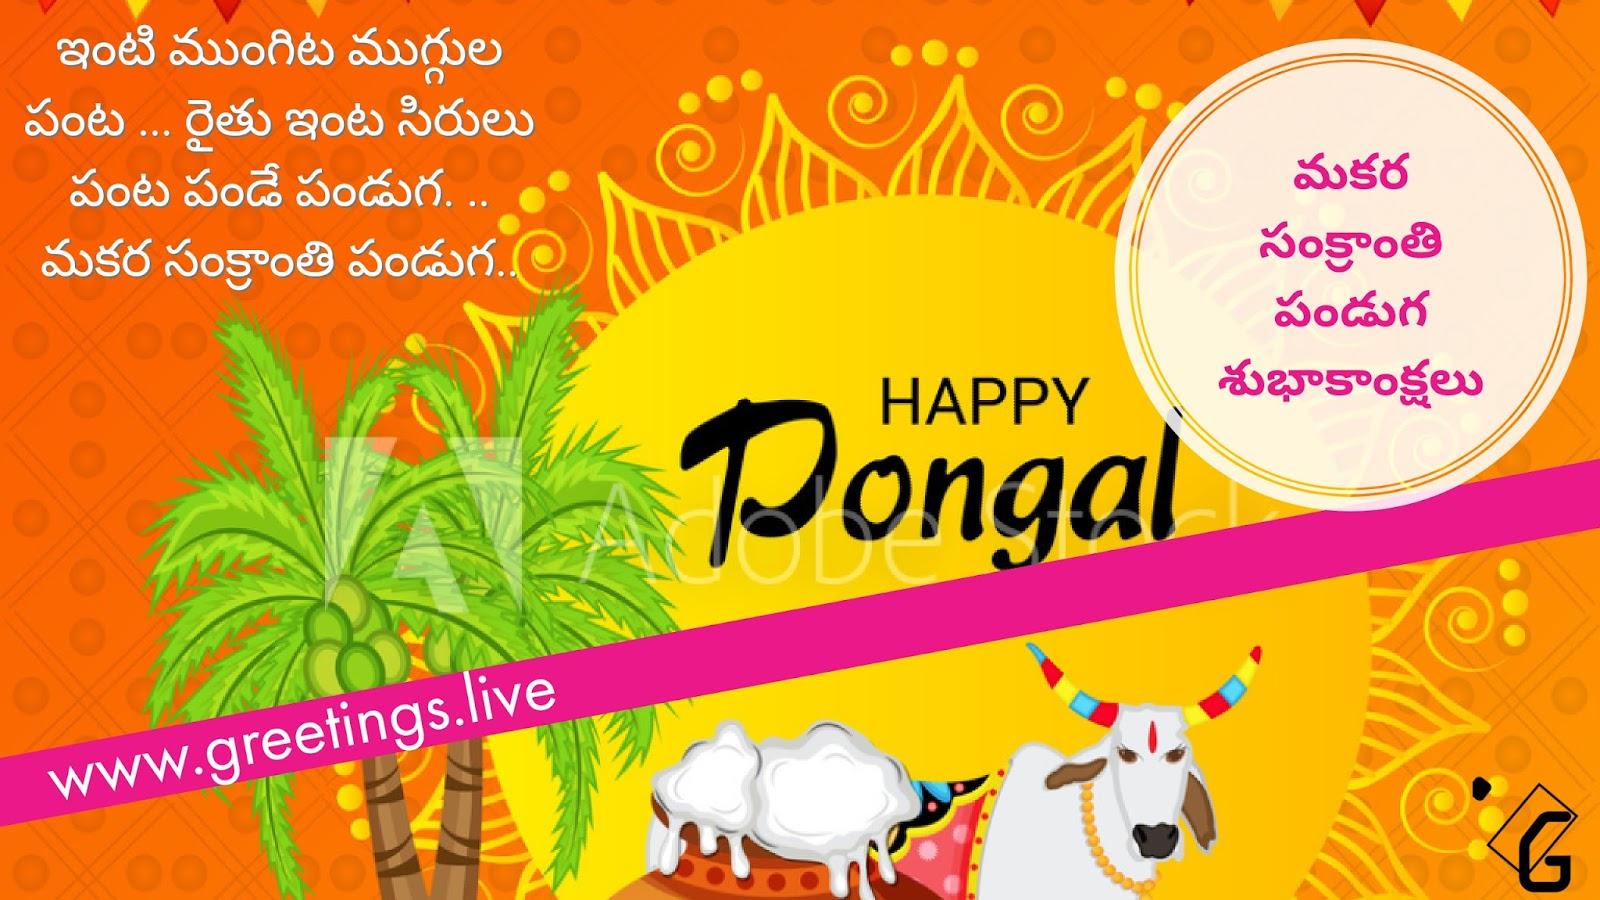 Telugu Sms Telugu Words Good Love Fun Friend